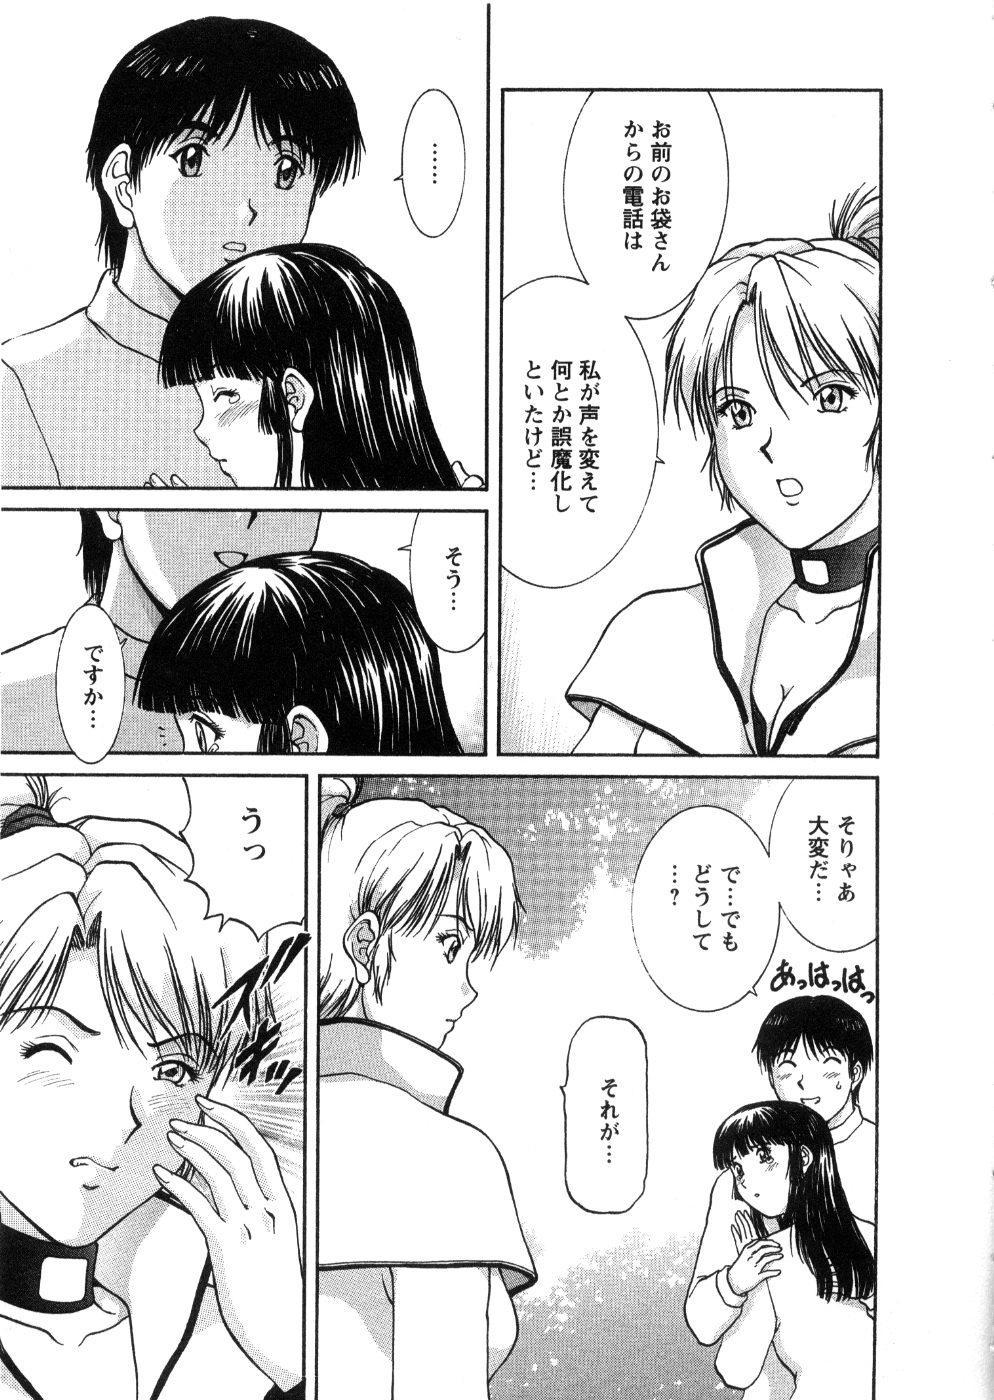 Oneechan-tachi ga Yatte Kuru 03 54